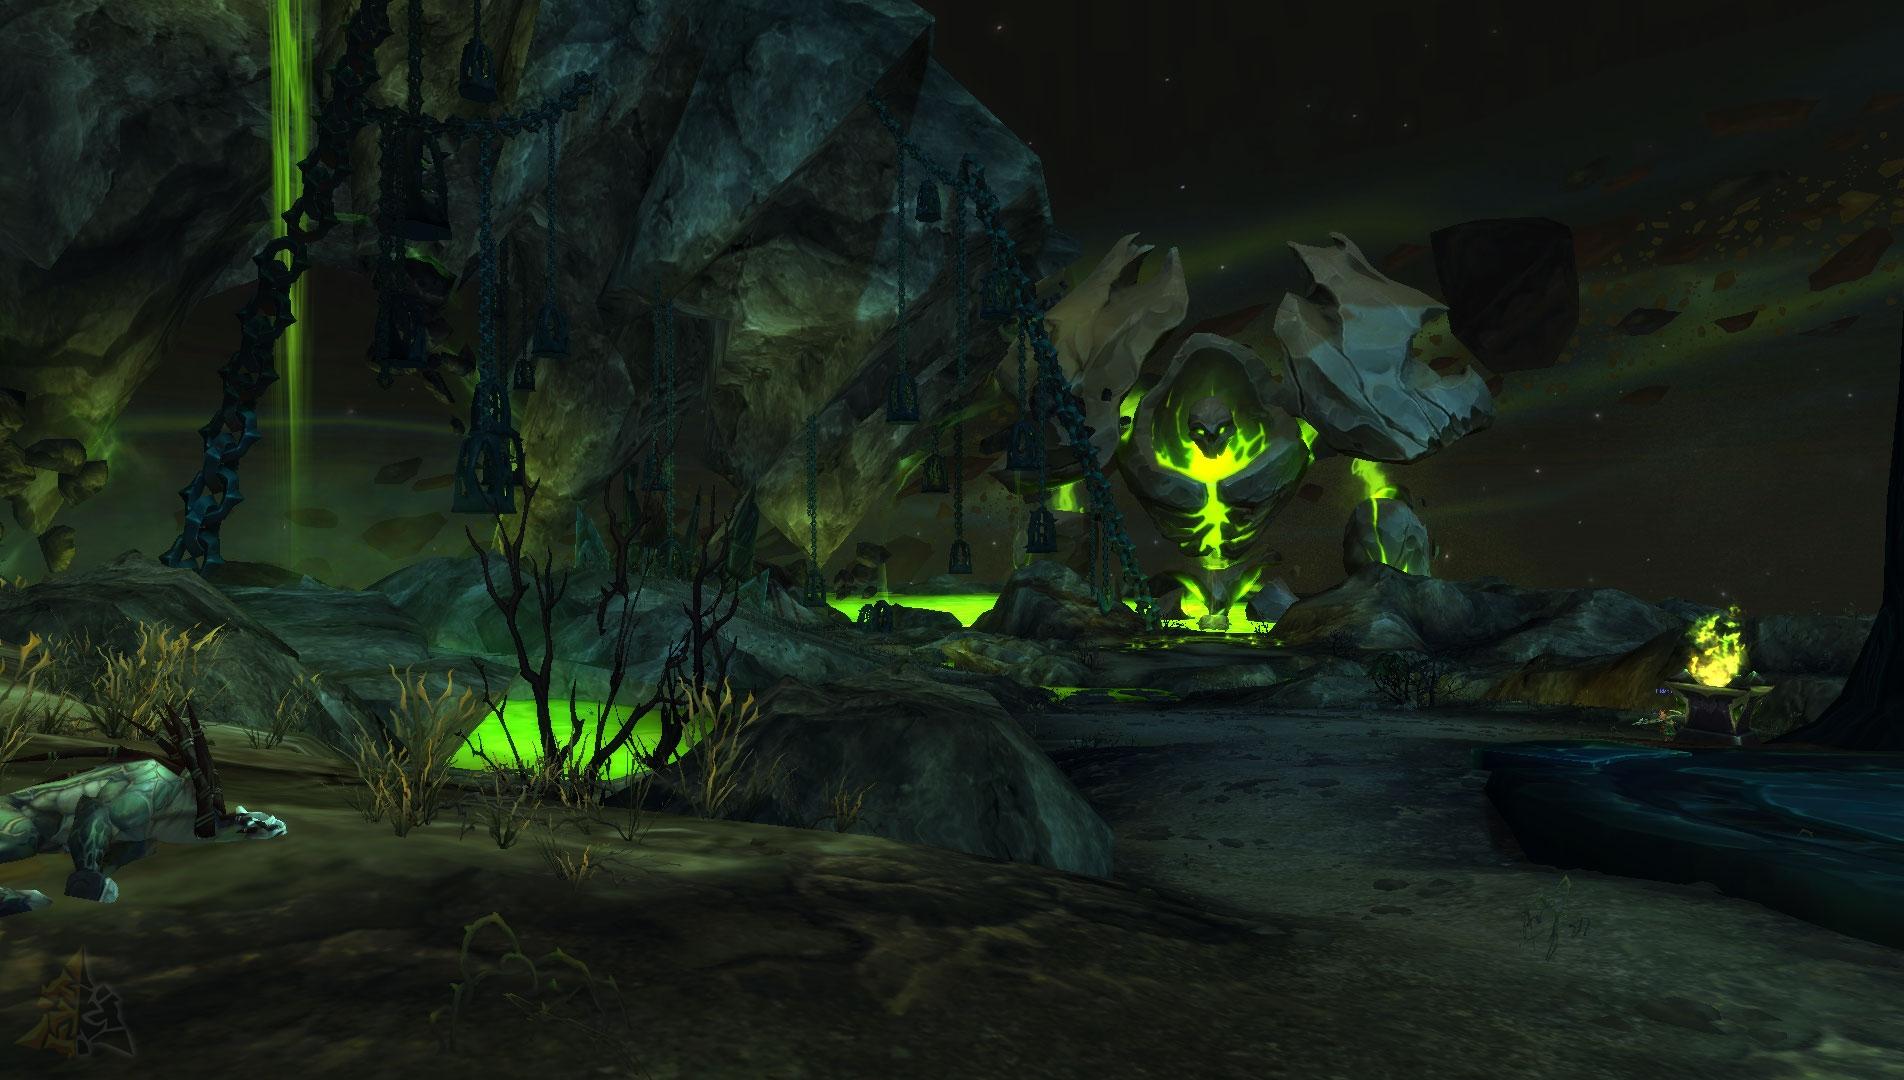 [Zonas de Legion] Mardum: Lore, Personajes e imágenes